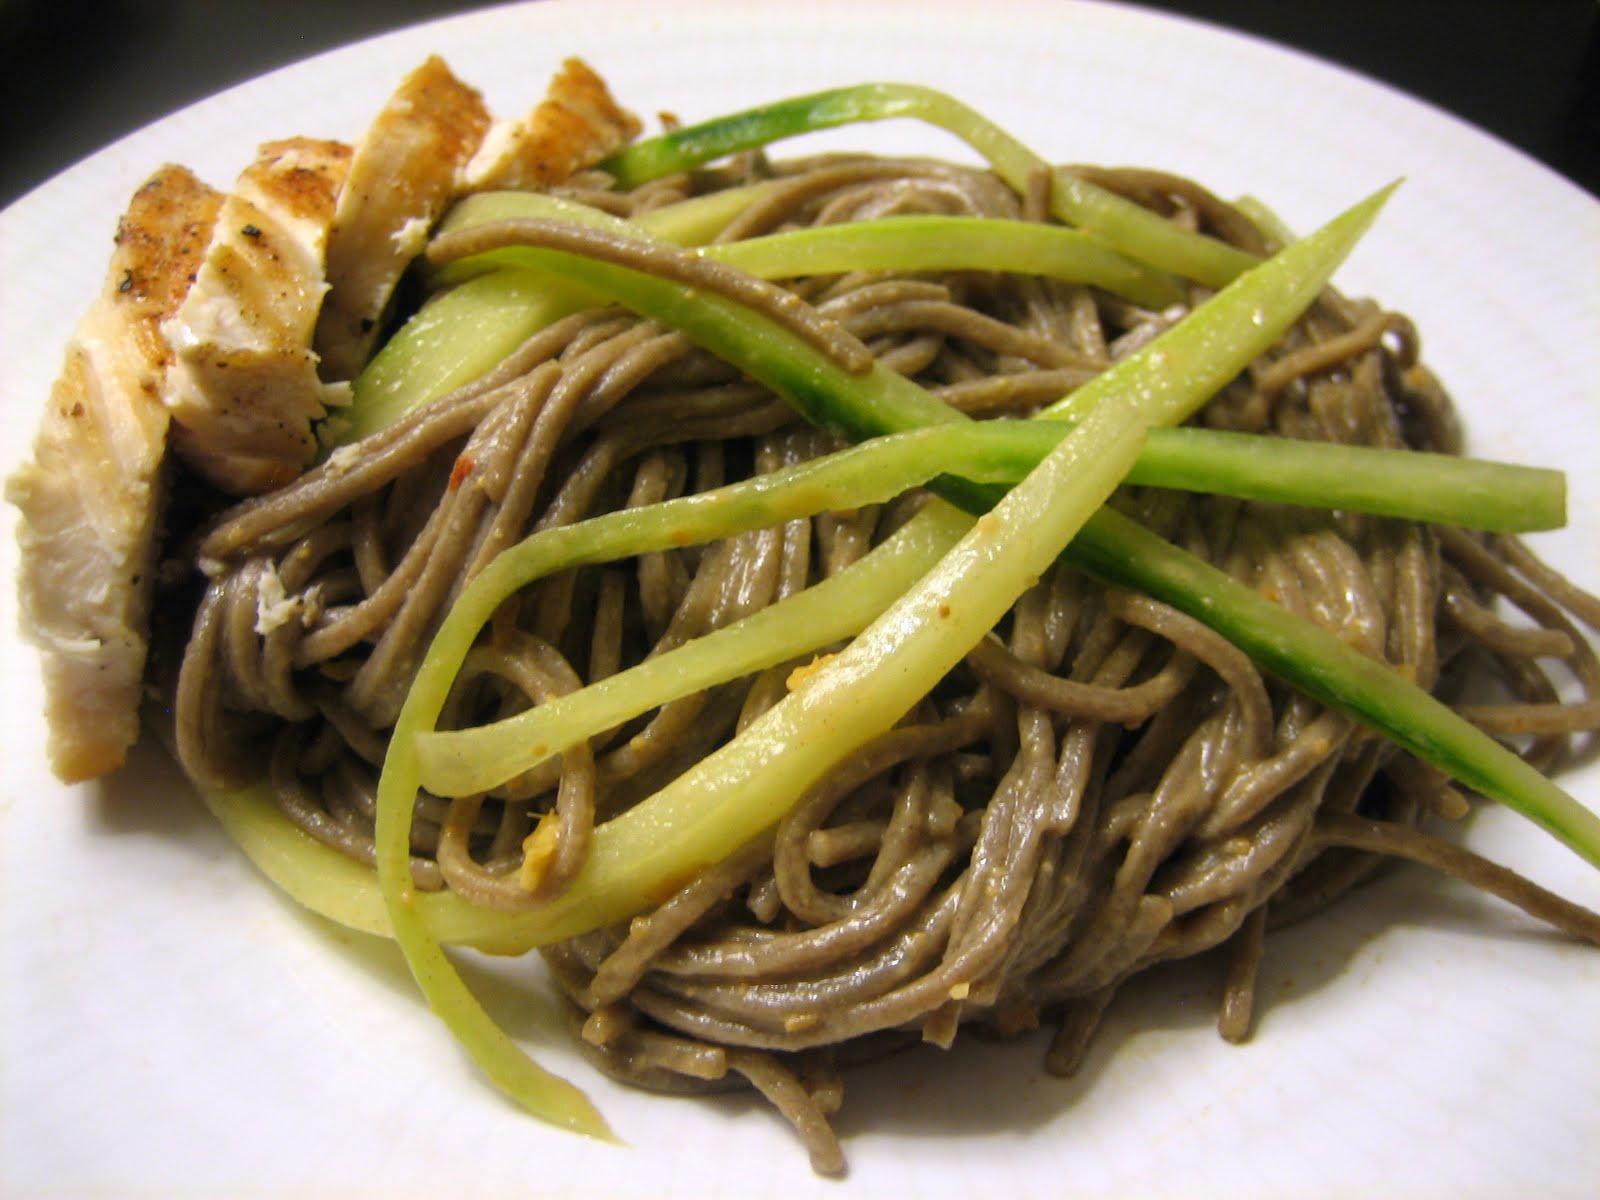 Test Kitchen: Cold Peanut Sesame Noodles